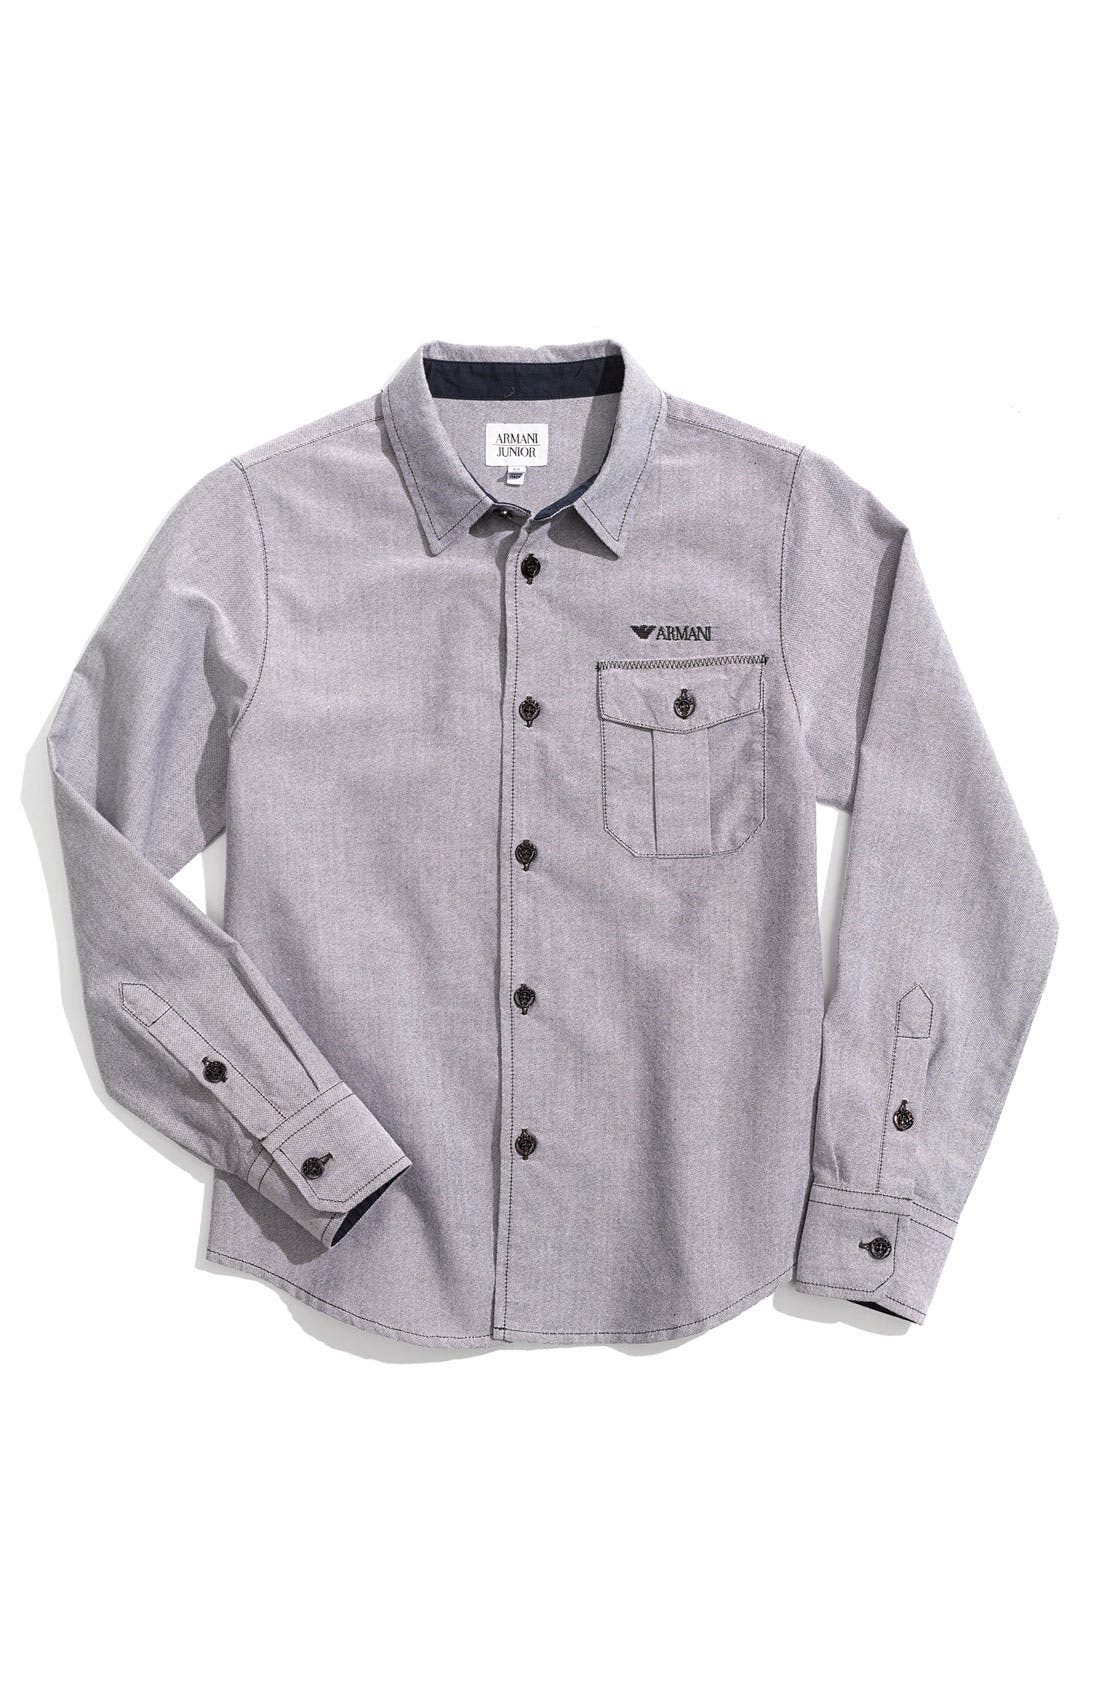 Main Image - Armani Junior Shirt (Little Boys)